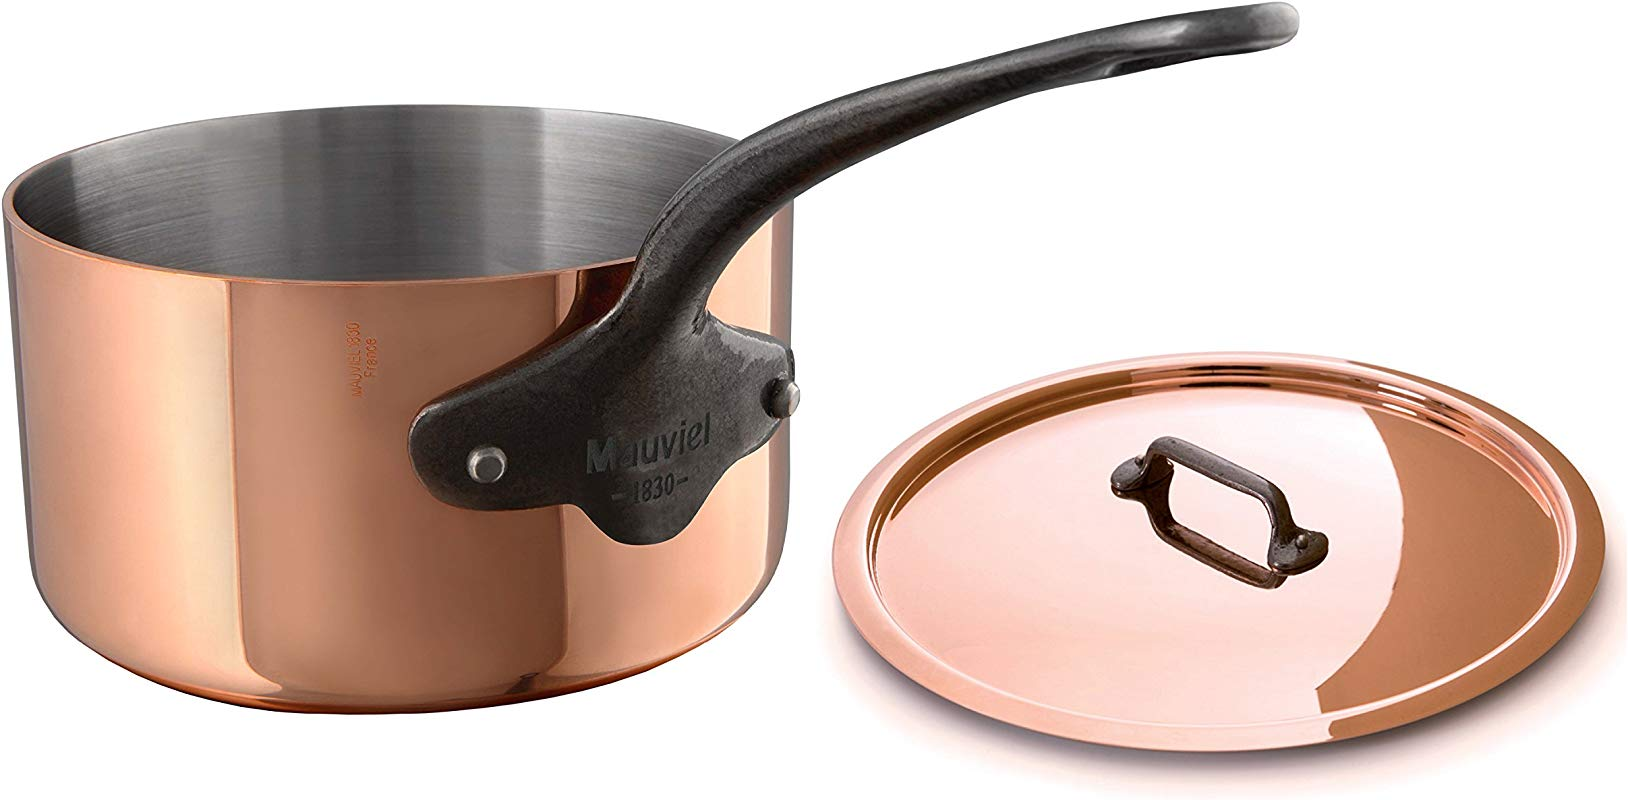 Mauviel 6540 15 M Heritage M250C 2 5mm Copper Saucepan With Lid 1 2 Quart